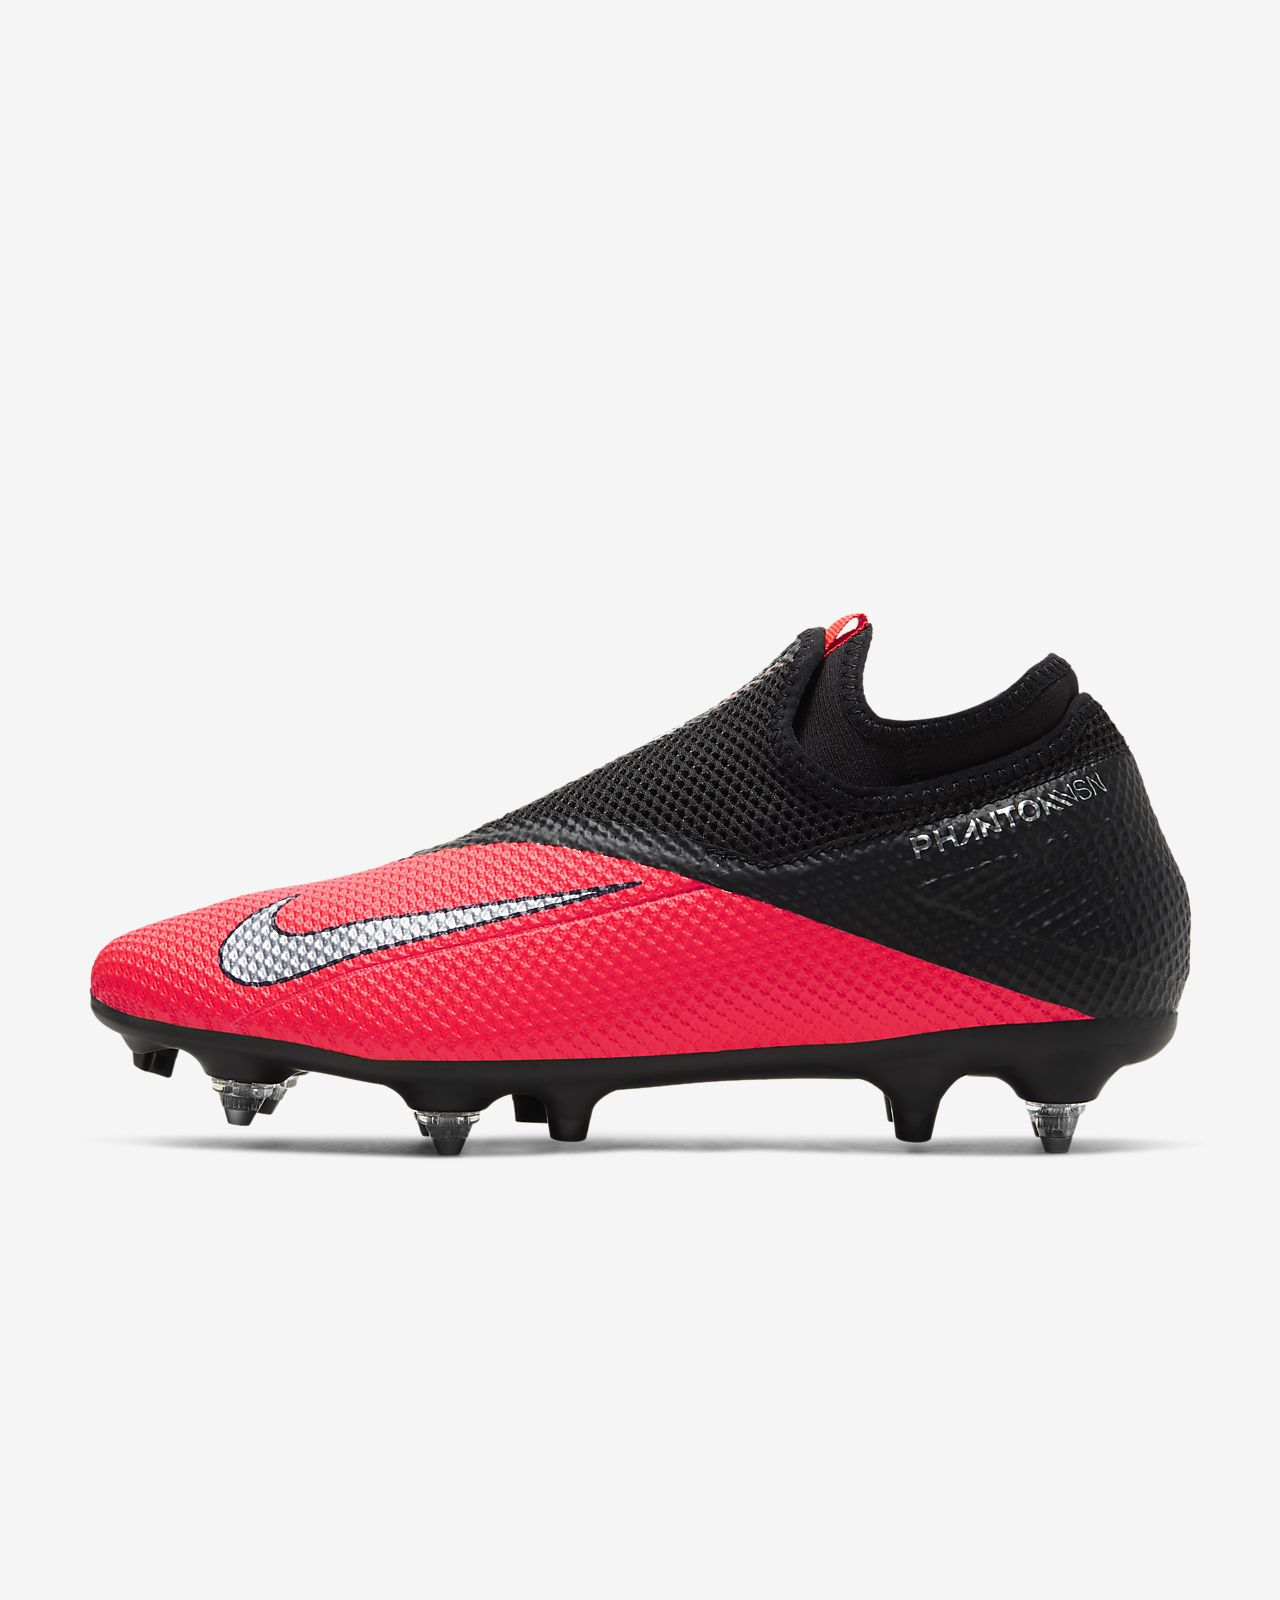 Chuteiras de futebol para terreno mole Nike Phantom Vision 2 Academy Dynamic Fit SG-PRO Anti-Clog Traction